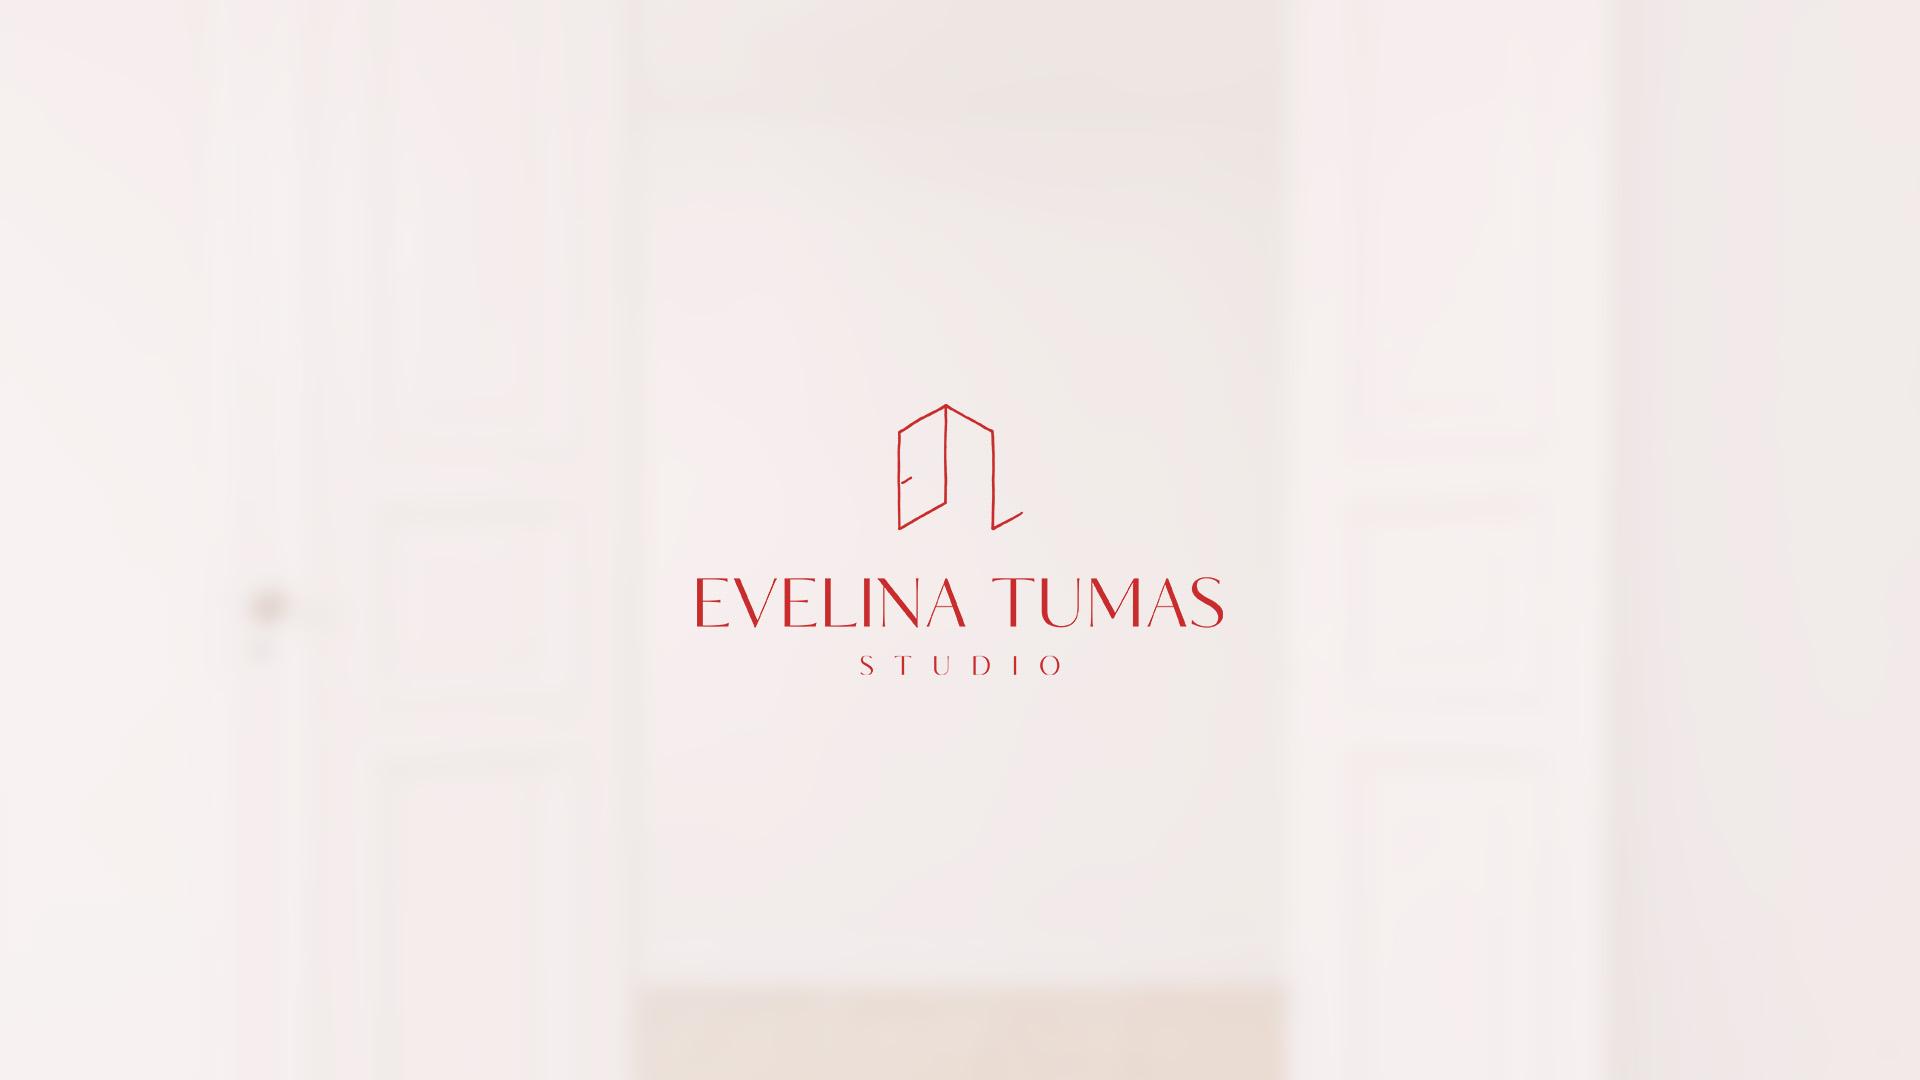 Lickerish-Evelina Tumas studio